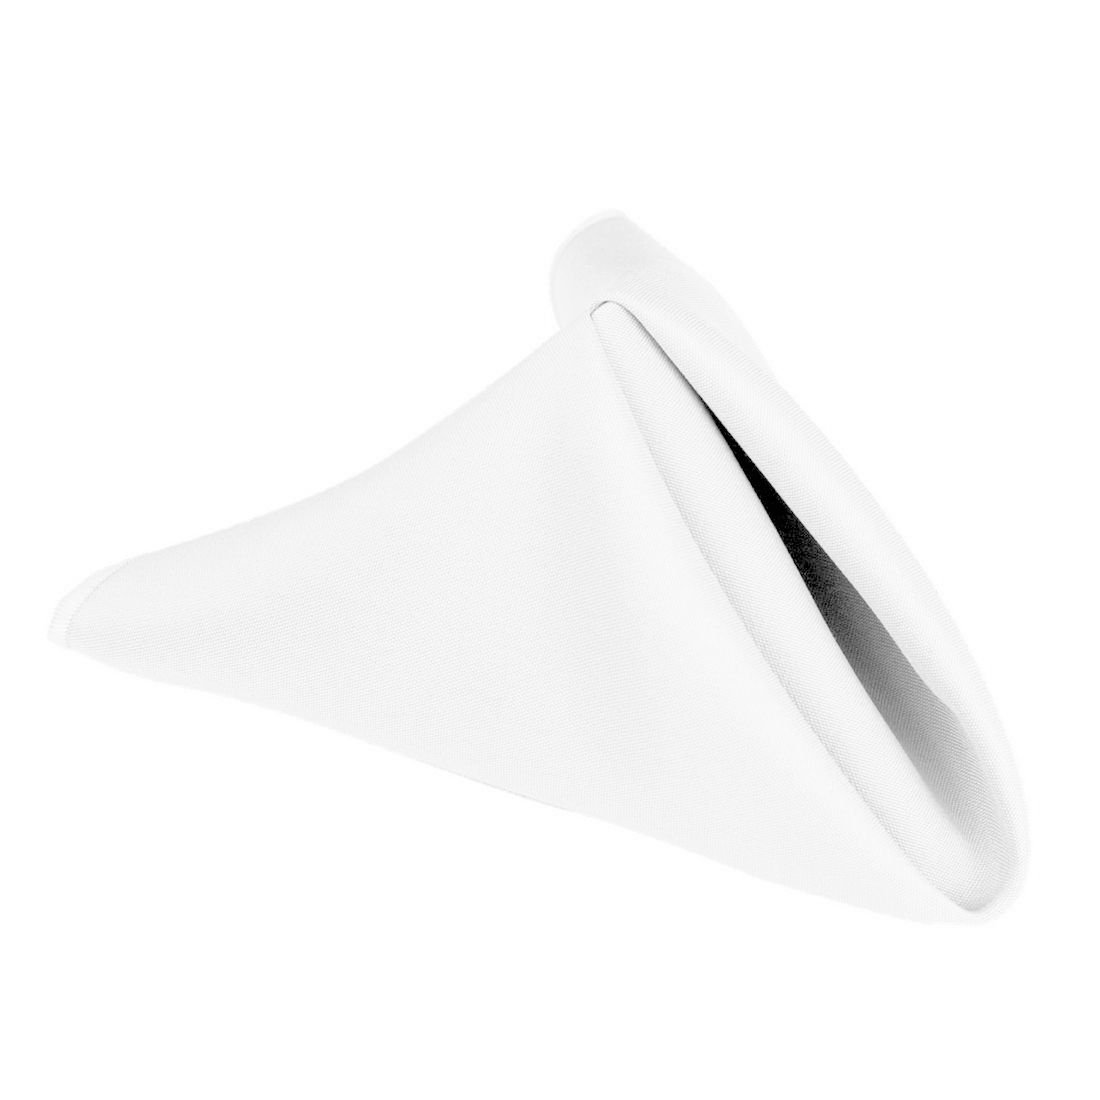 LinenTablecloth 17-Inch Polyester Napkins (1-Dozen) White